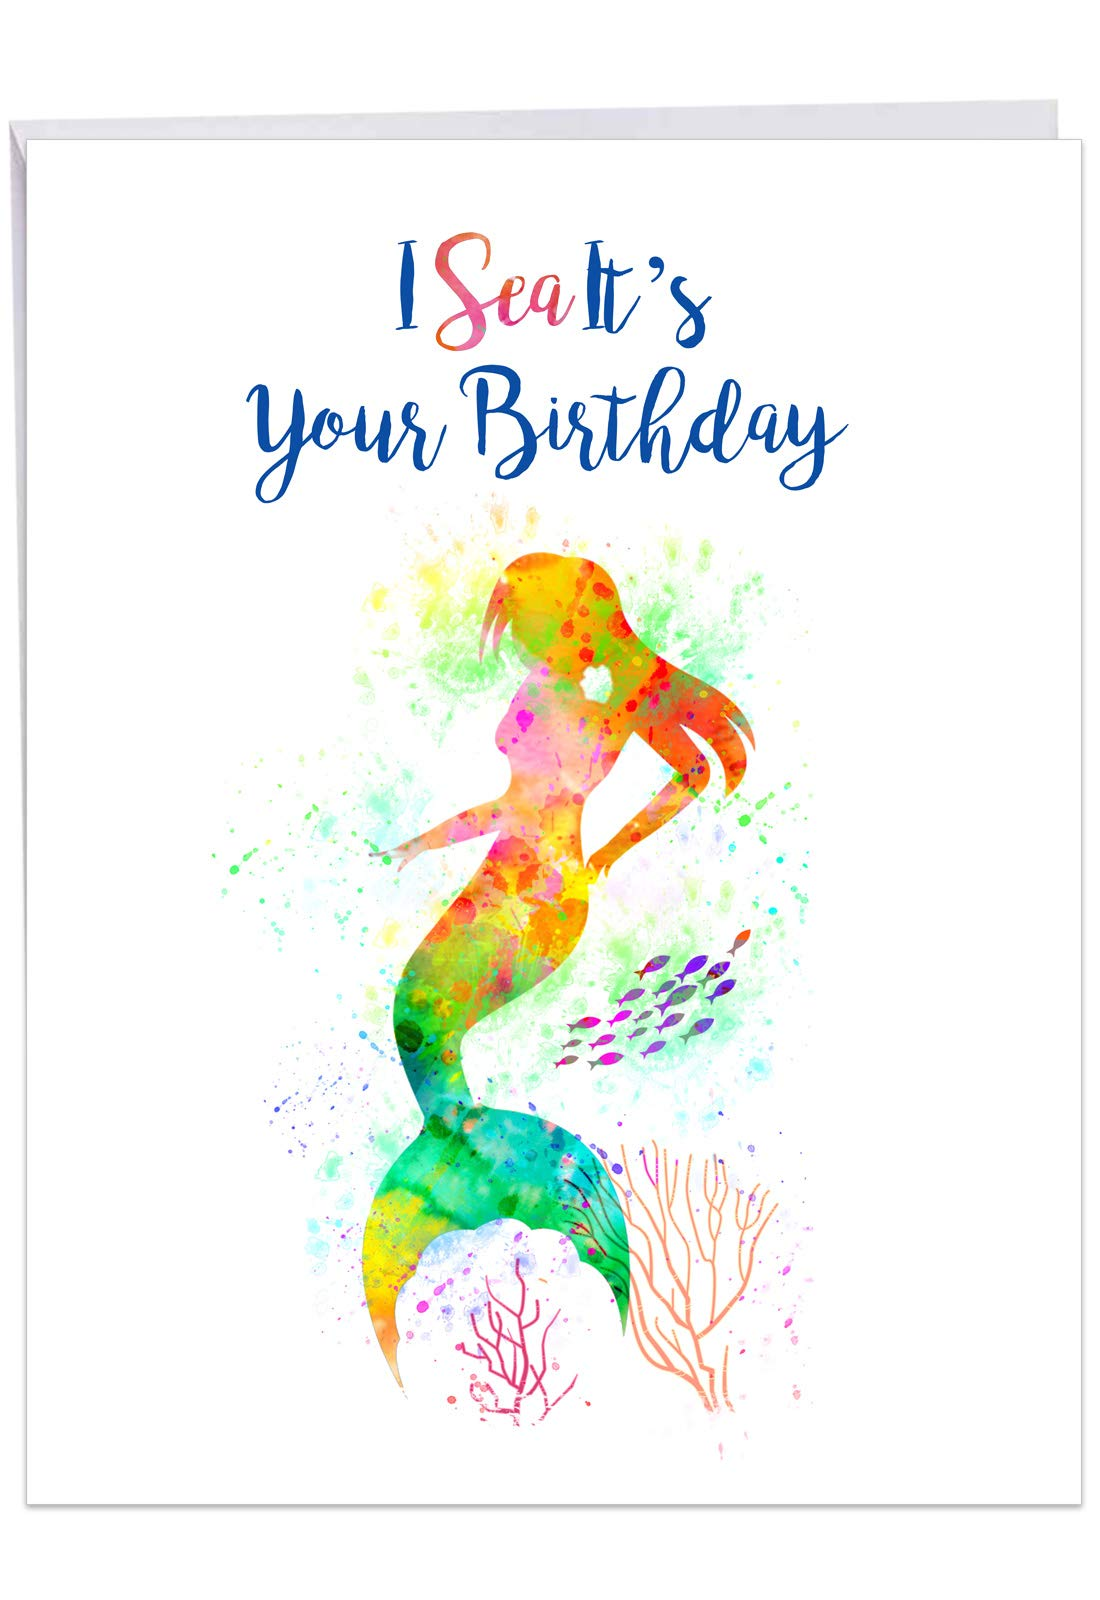 Funky Rainbow Mermaids - Cute Watercolor Happy Birthday Card with Envelope (Big 8.5 x 11 Inch) - Inspiring Sea Mermaid, Colorful Bday Notecard for Kids, Girls - Appreciation Greeting Gift J6863GBDG